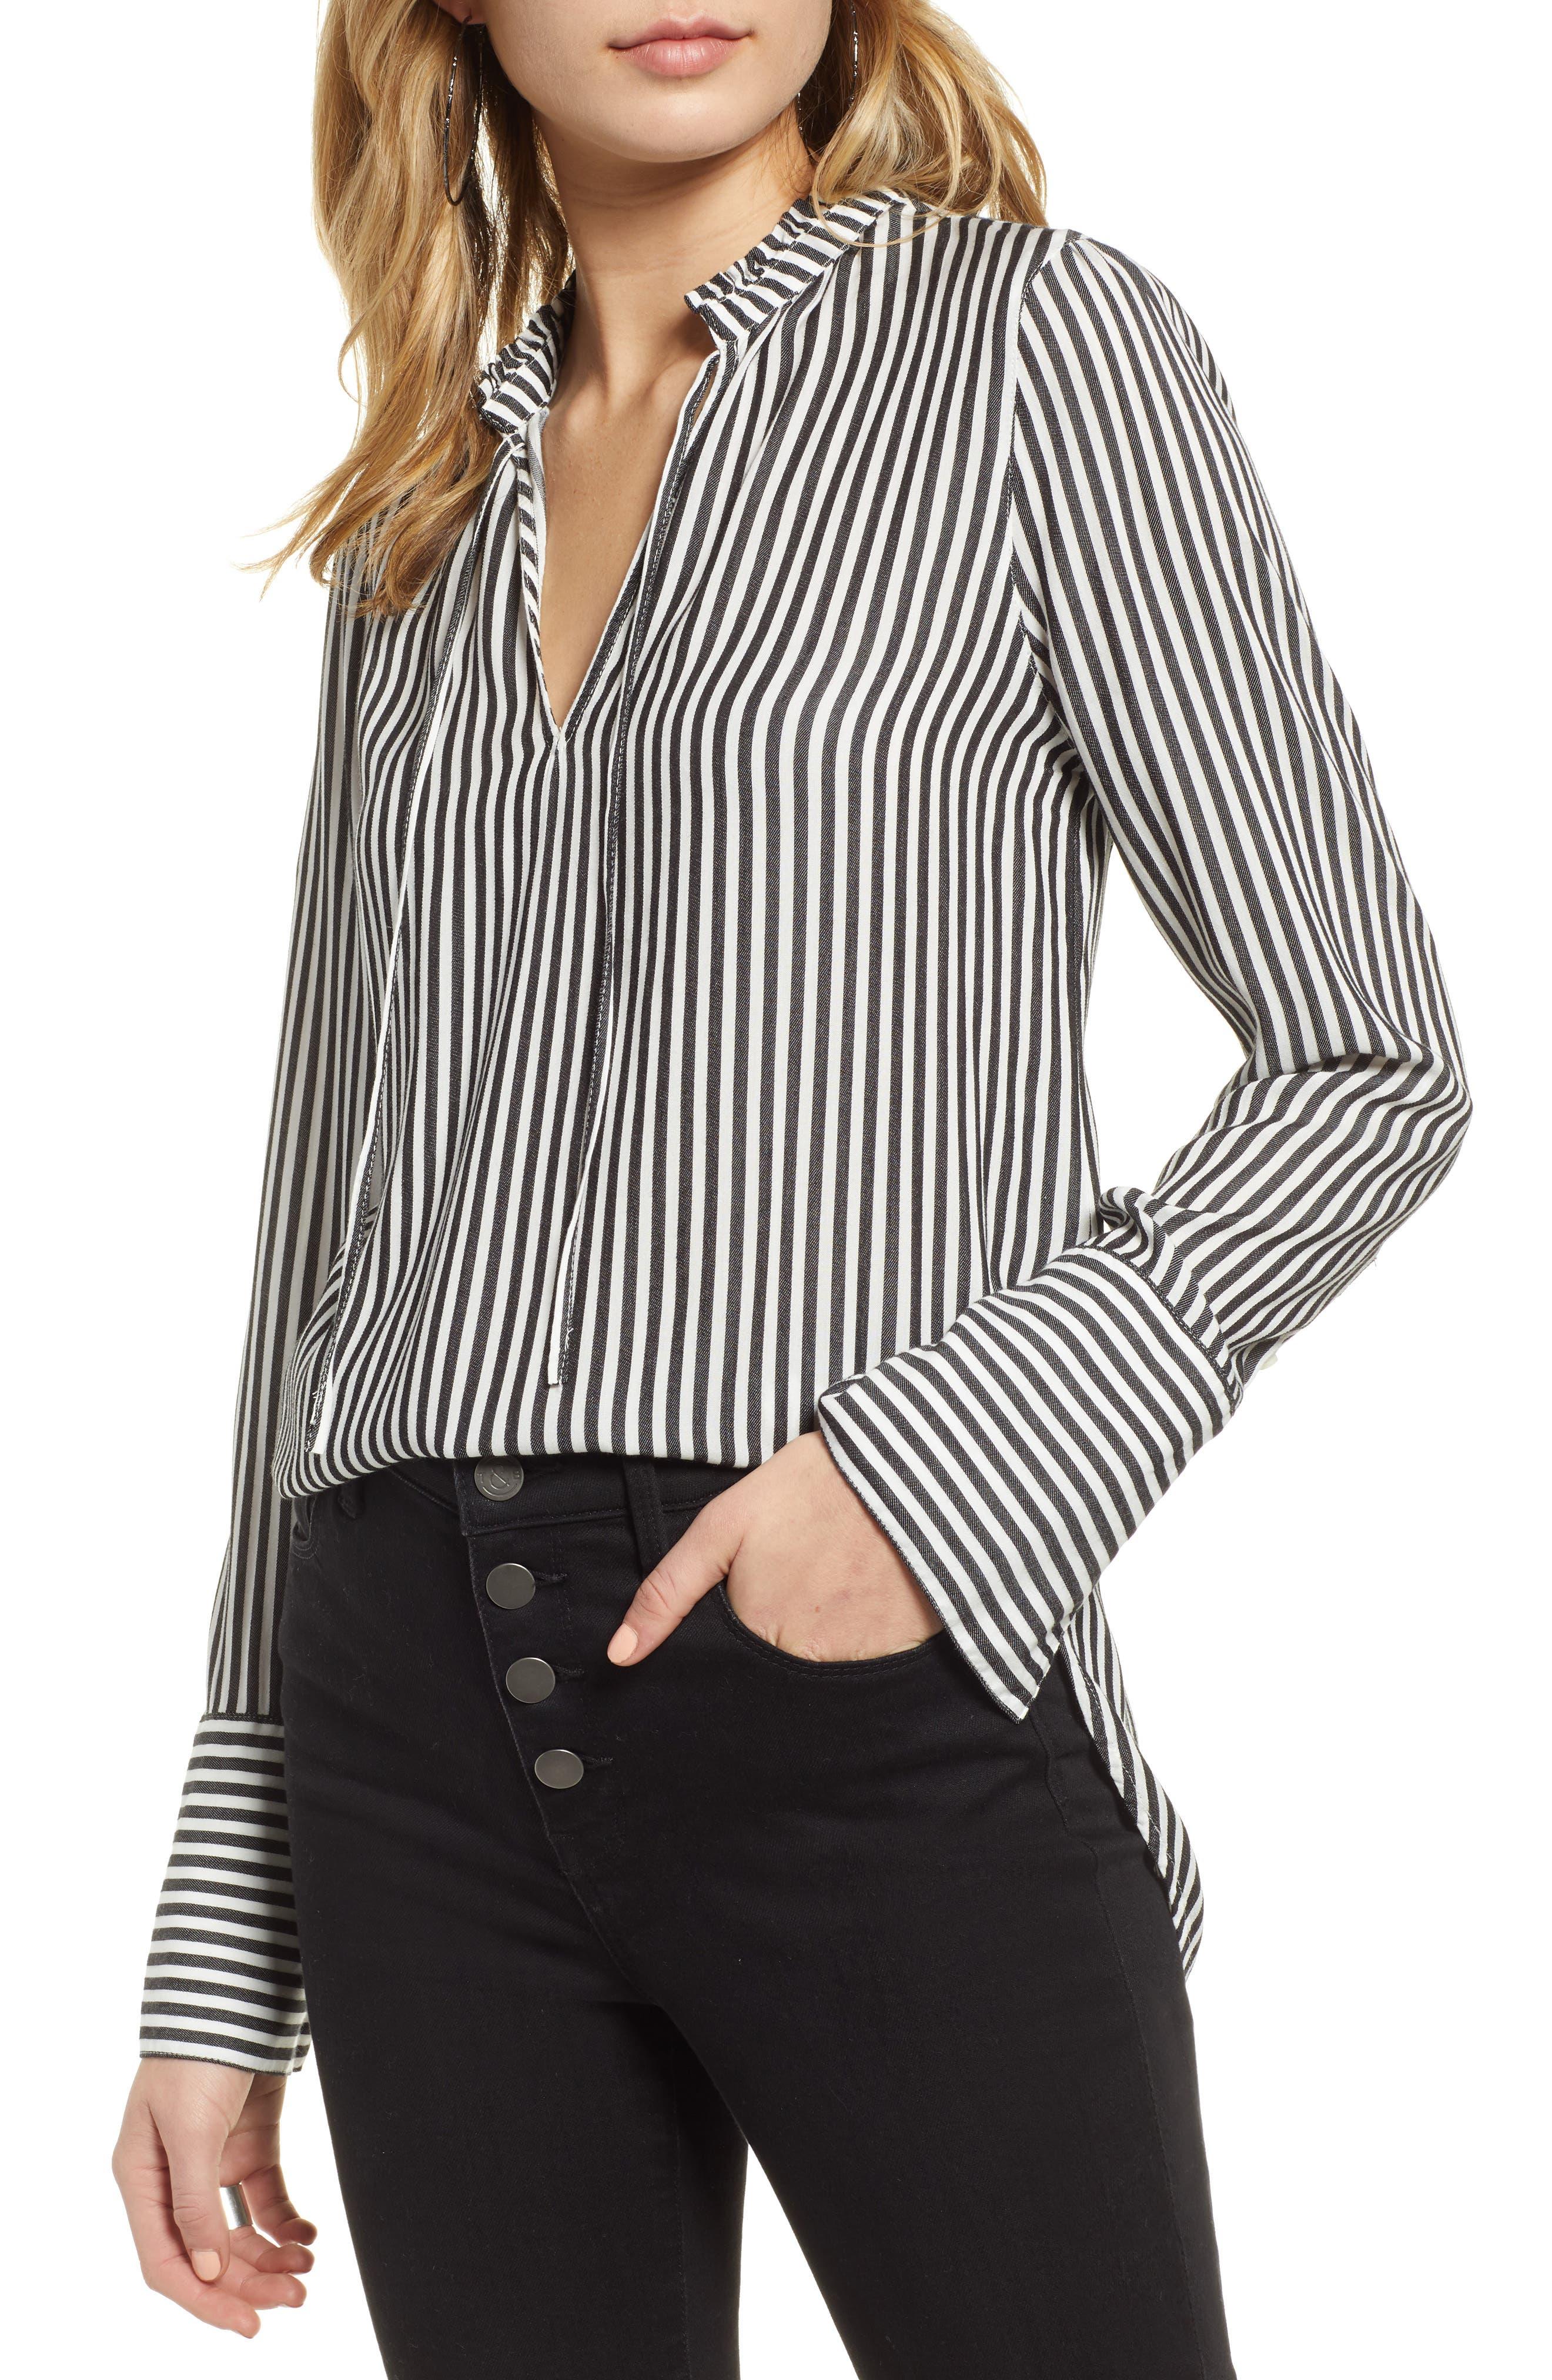 TREASURE & BOND Stripe Ruffle Neck Shirt, Main, color, BLACK- WHITE SARA STRIPE